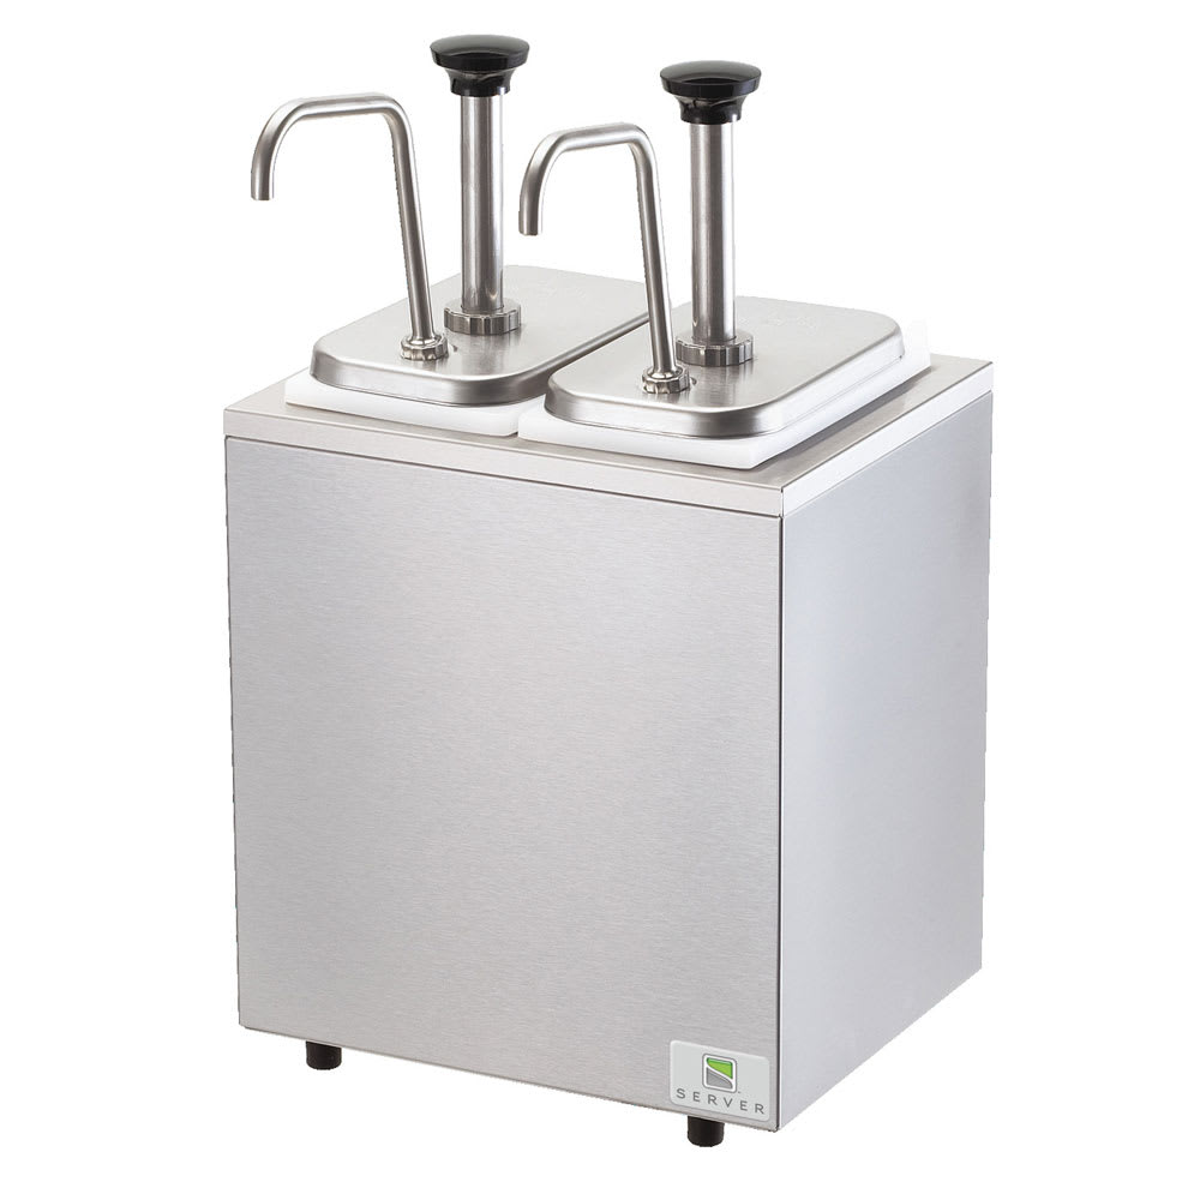 Server 79890 Pump Style Condiment Dispenser w/ (2) 1.25 oz/Stroke, Stainless